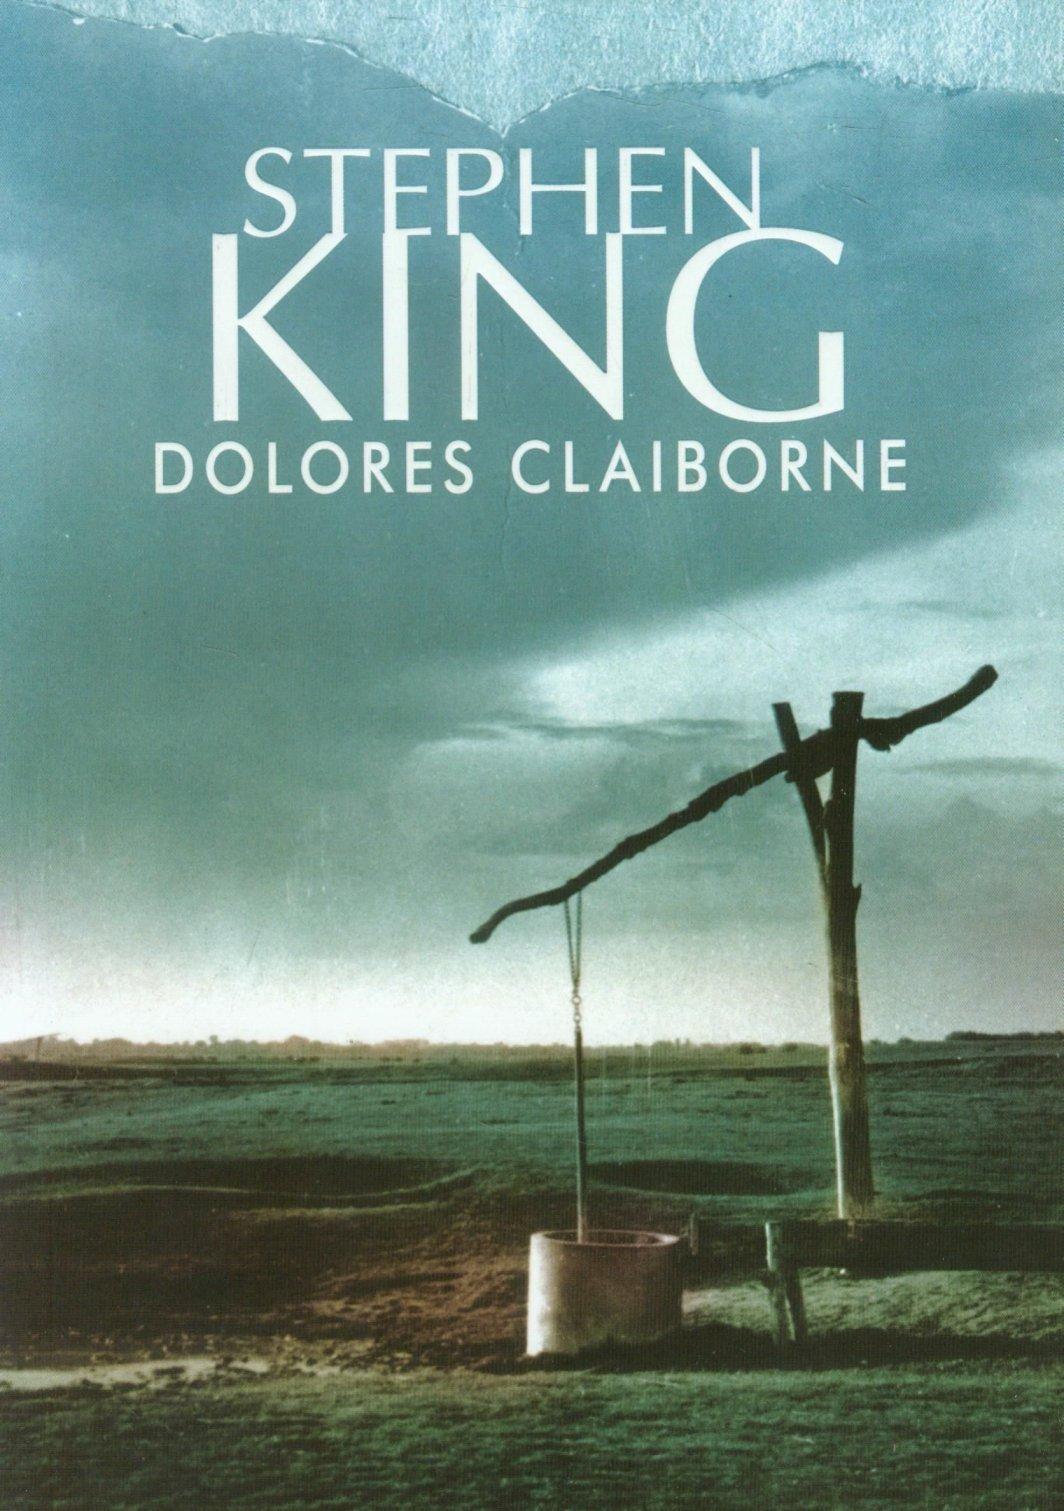 Dolores Claiborne w.2014 (133078) 1